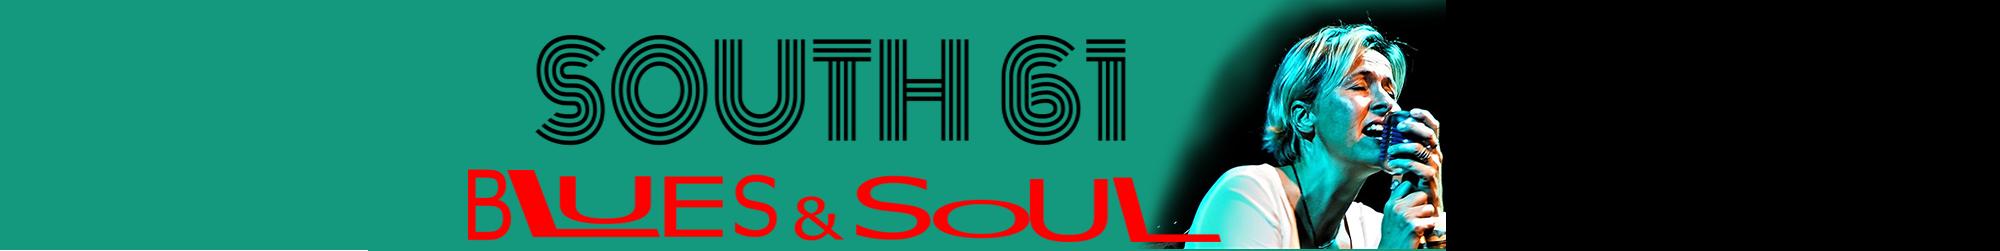 SOUTH-61 Logo